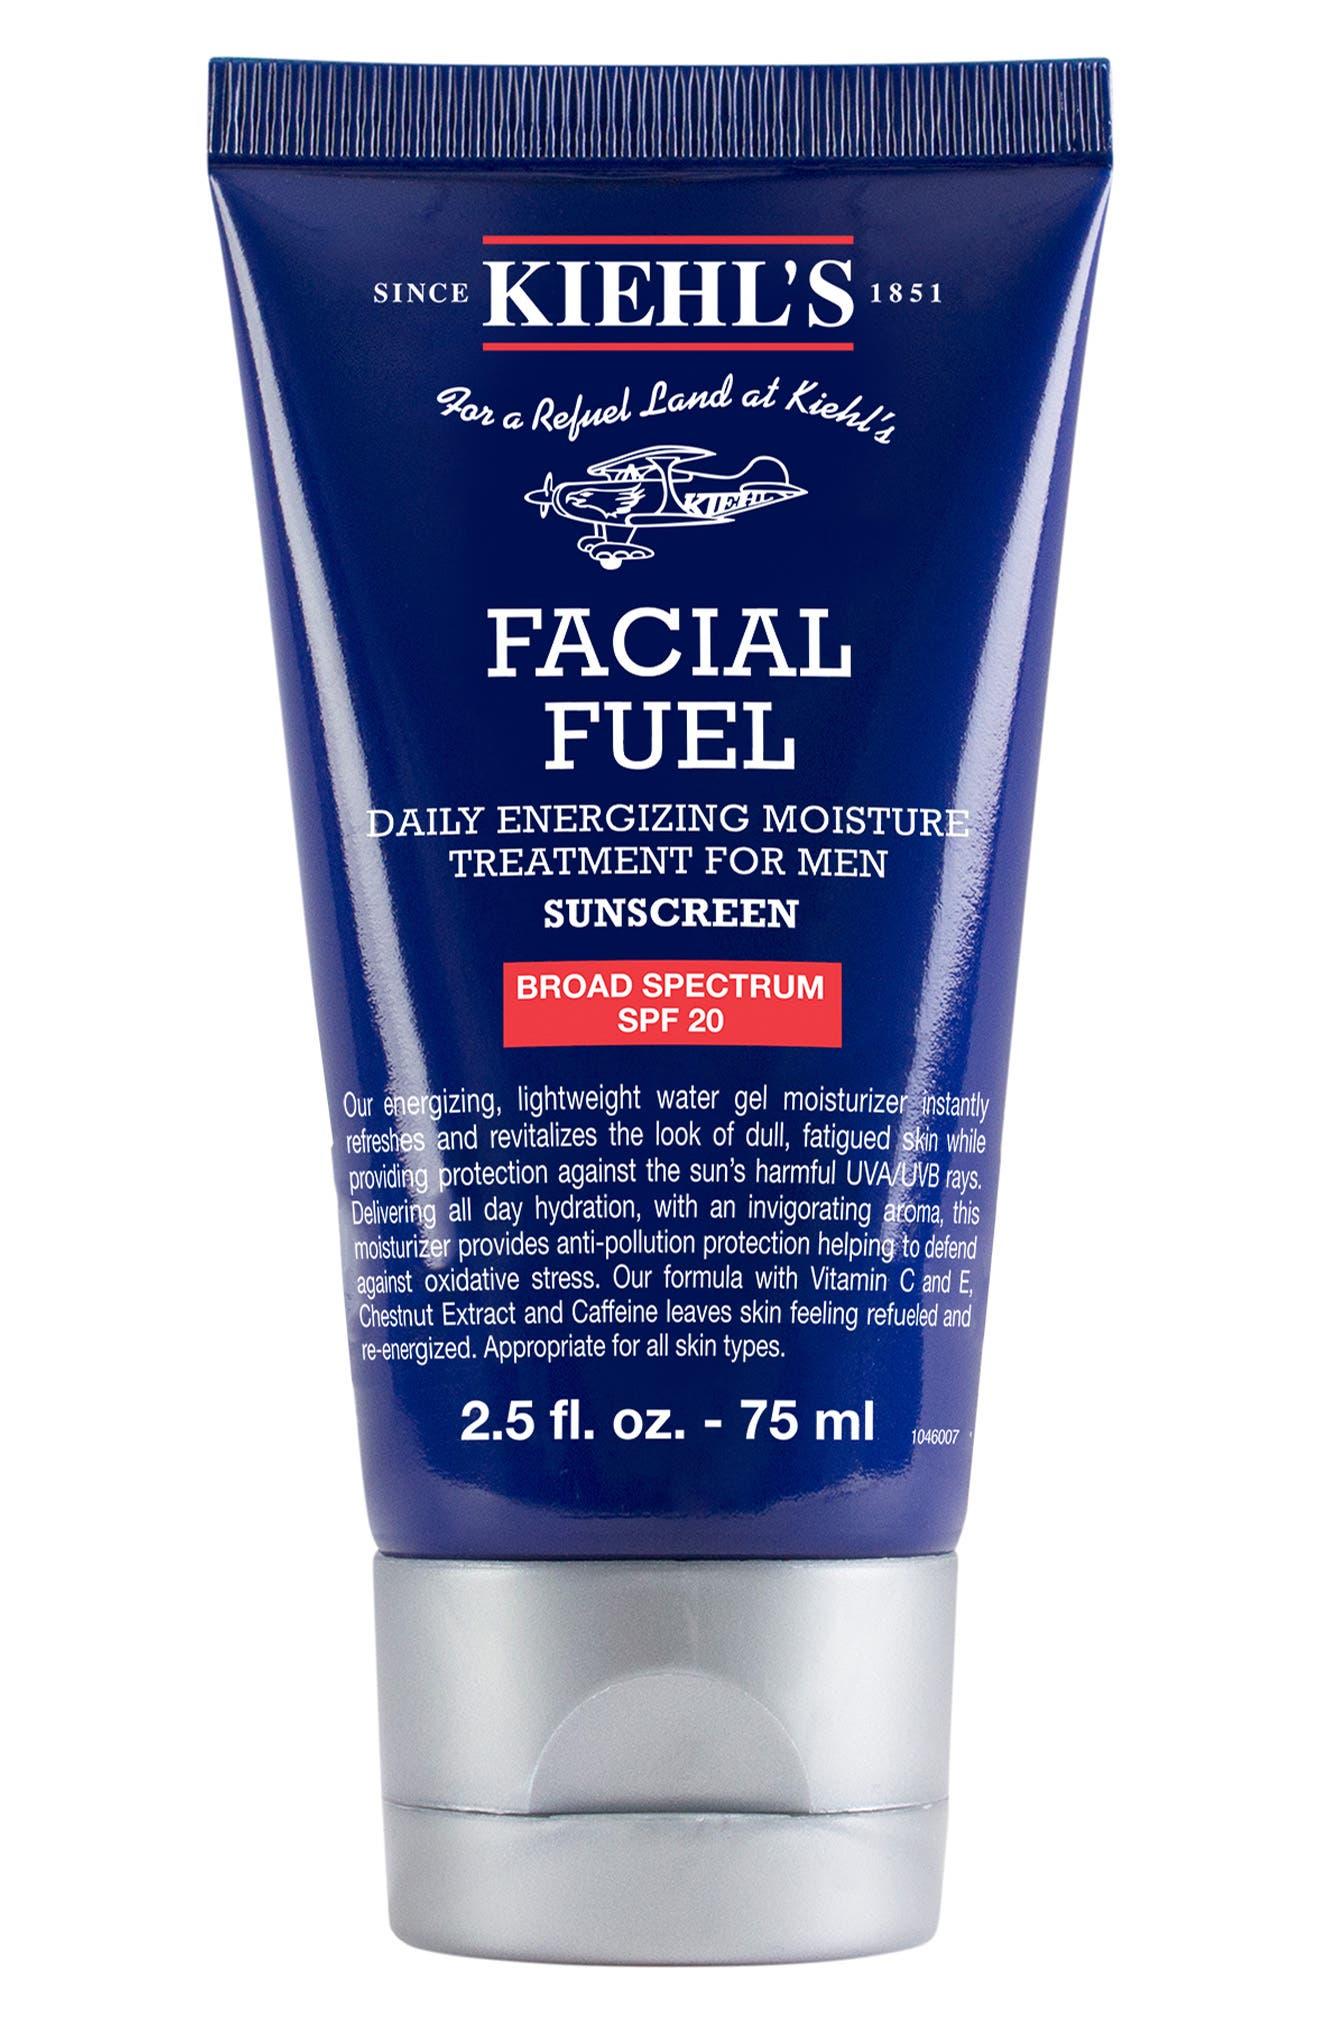 Facial Fuel Daily Energizing Moisture Treatment for Men SPF 20,                             Main thumbnail 1, color,                             NO COLOR